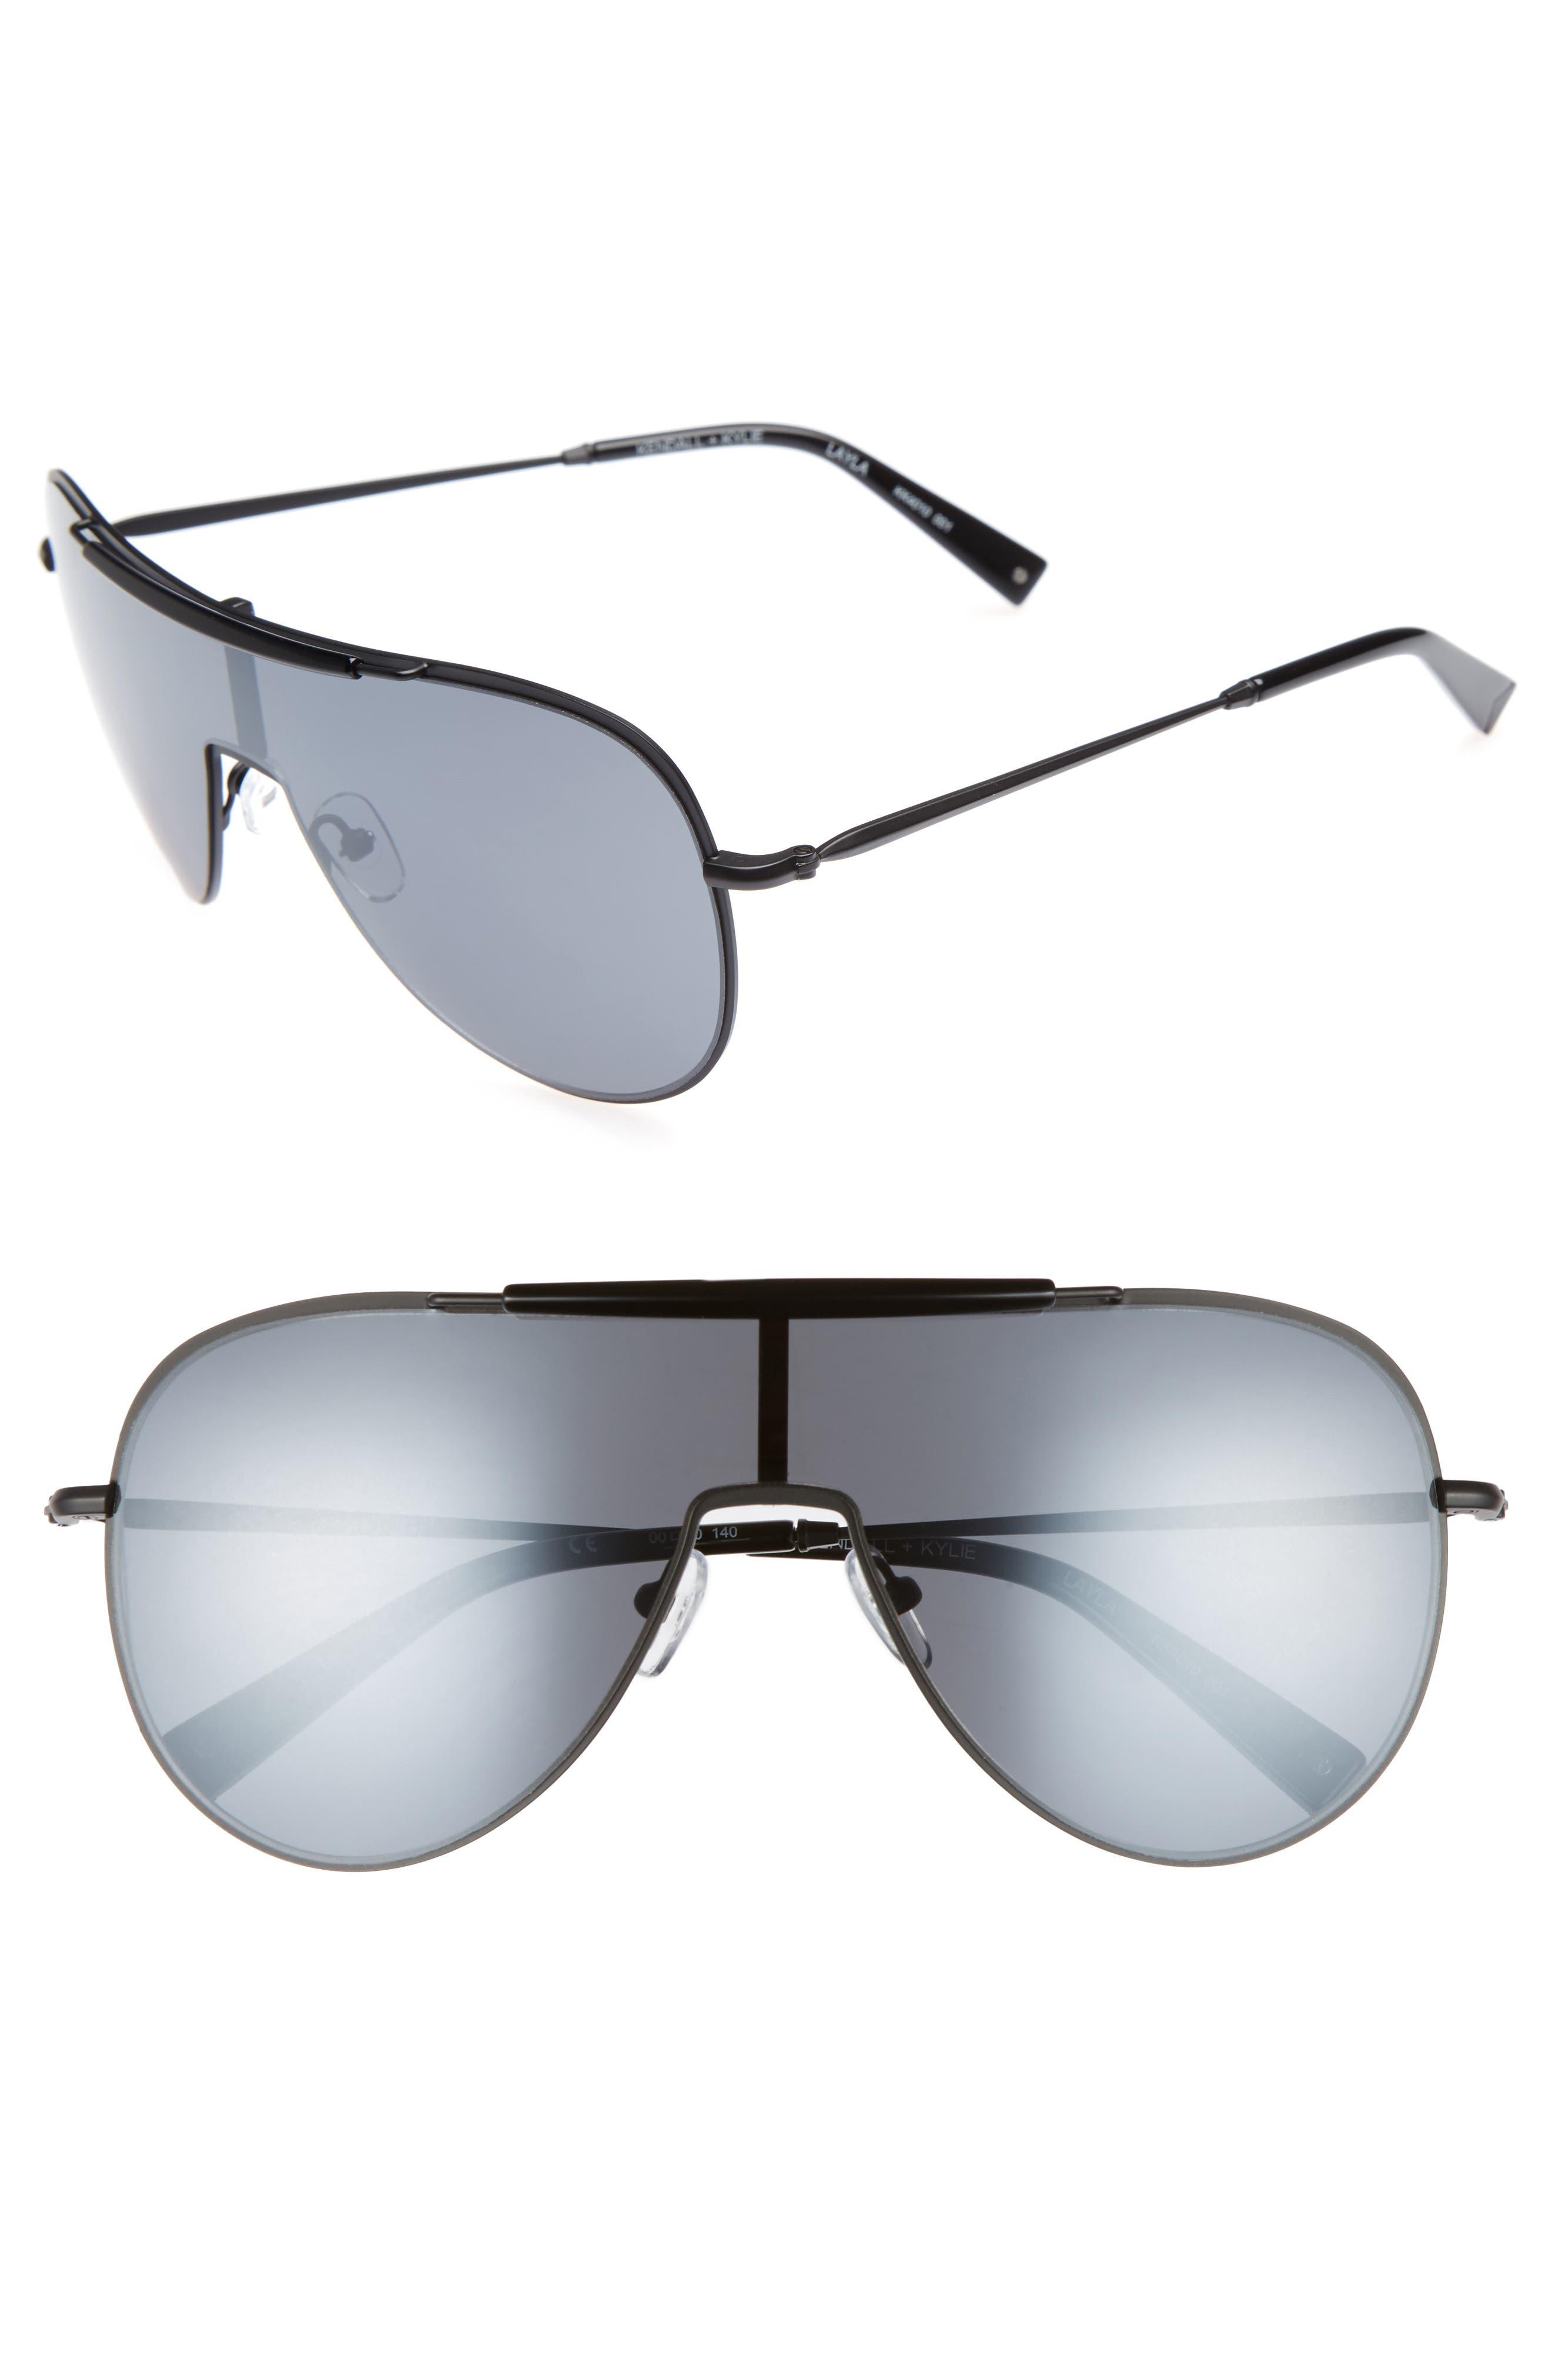 Shield Aviator Sunglasses,                         Main,                         color, Black/ Black